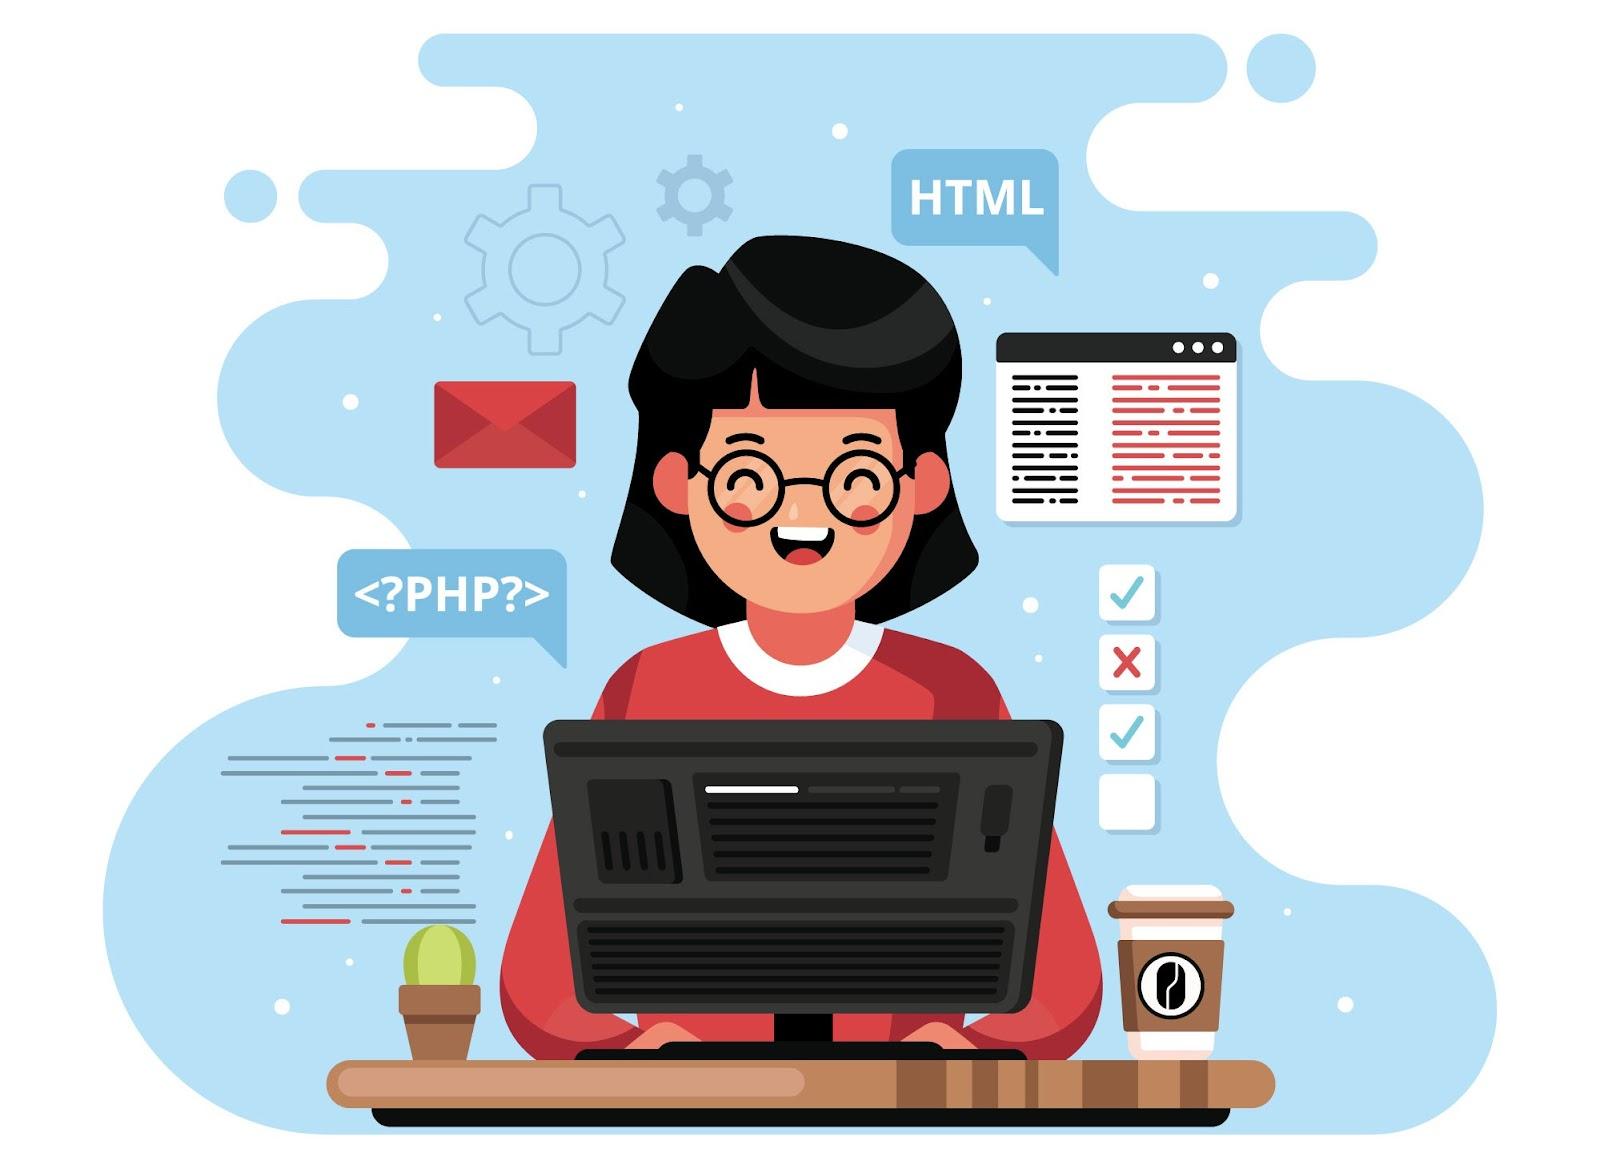 Преимущества PHP-фреймворка Laravel в разработке веб-приложений